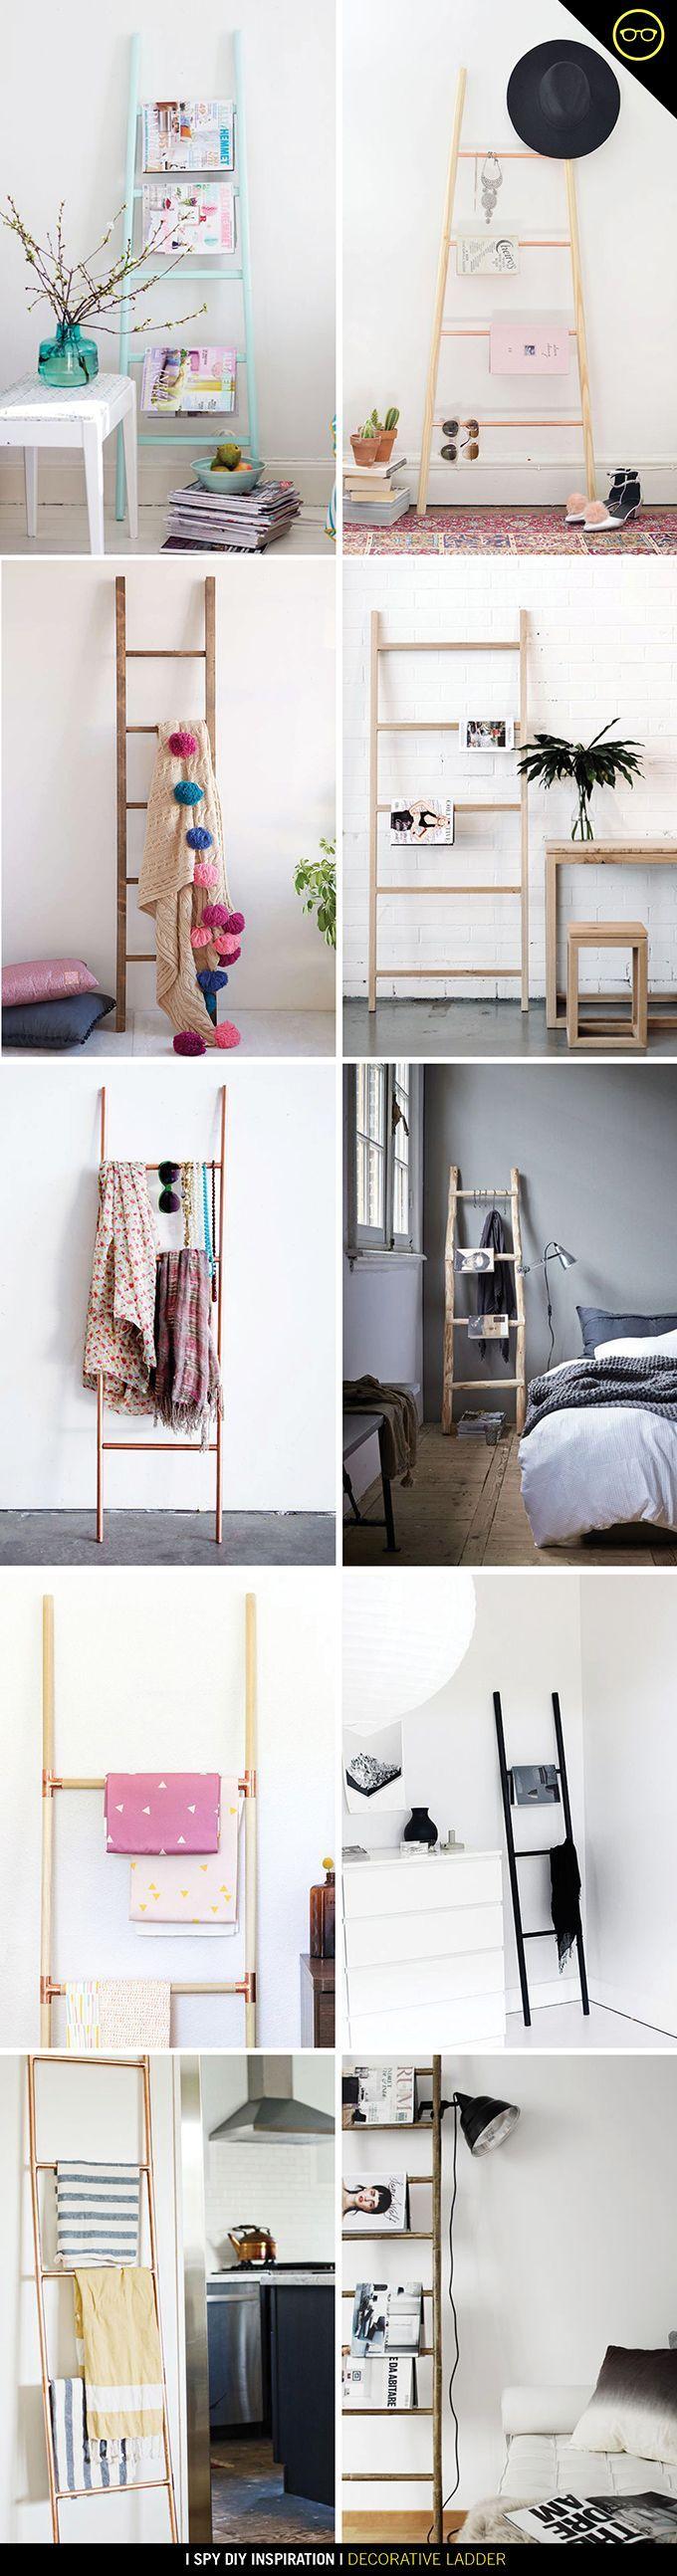 DIY INSPIRATION | Decorative Ladder